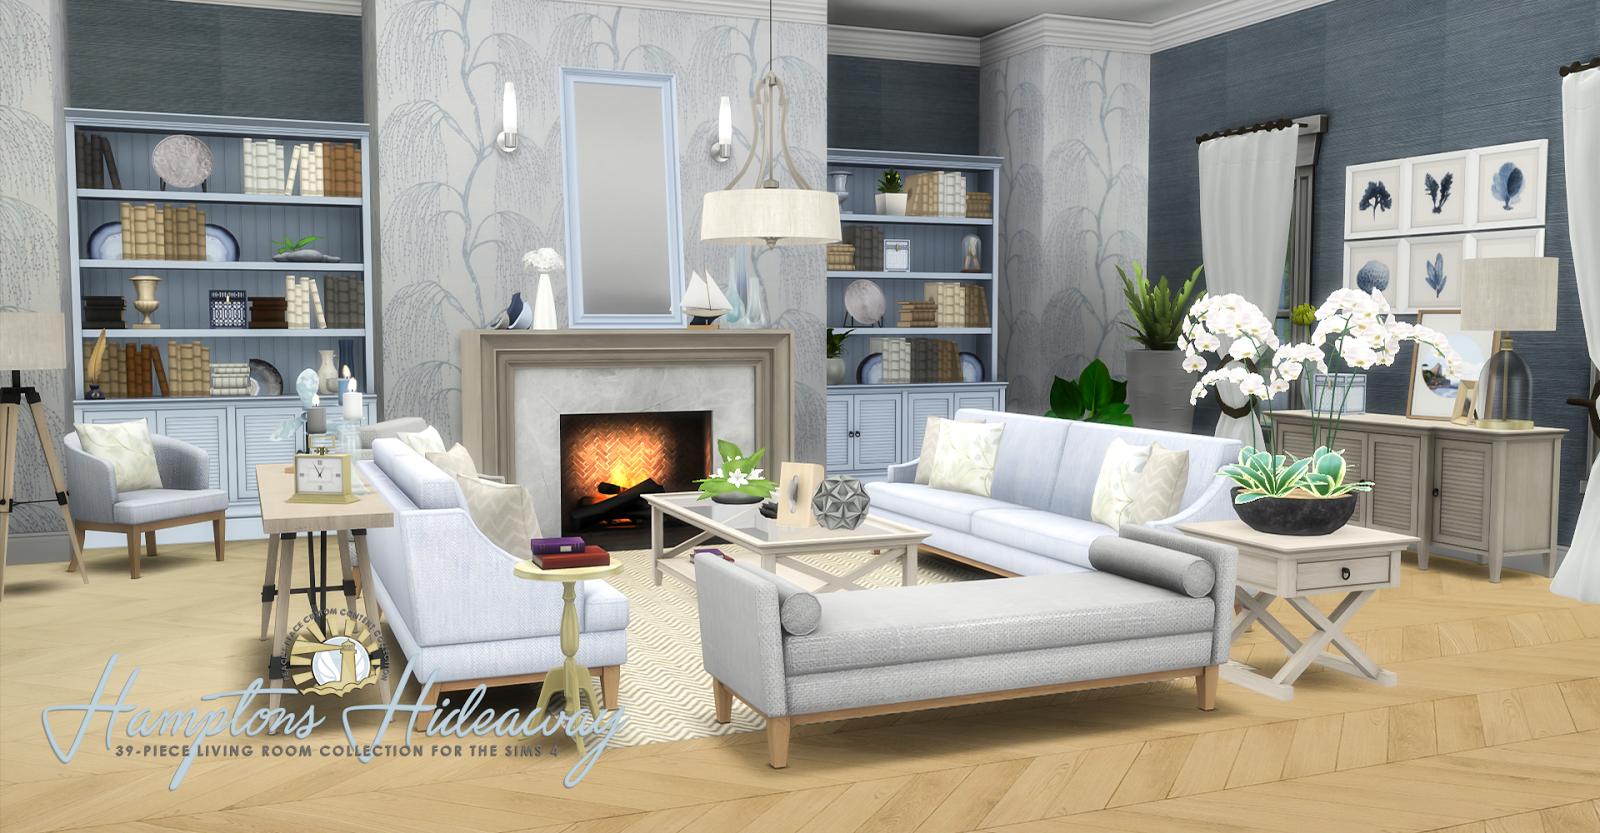 Simsational Designs: Hamptons Hideaway - Living Room Set for TS20